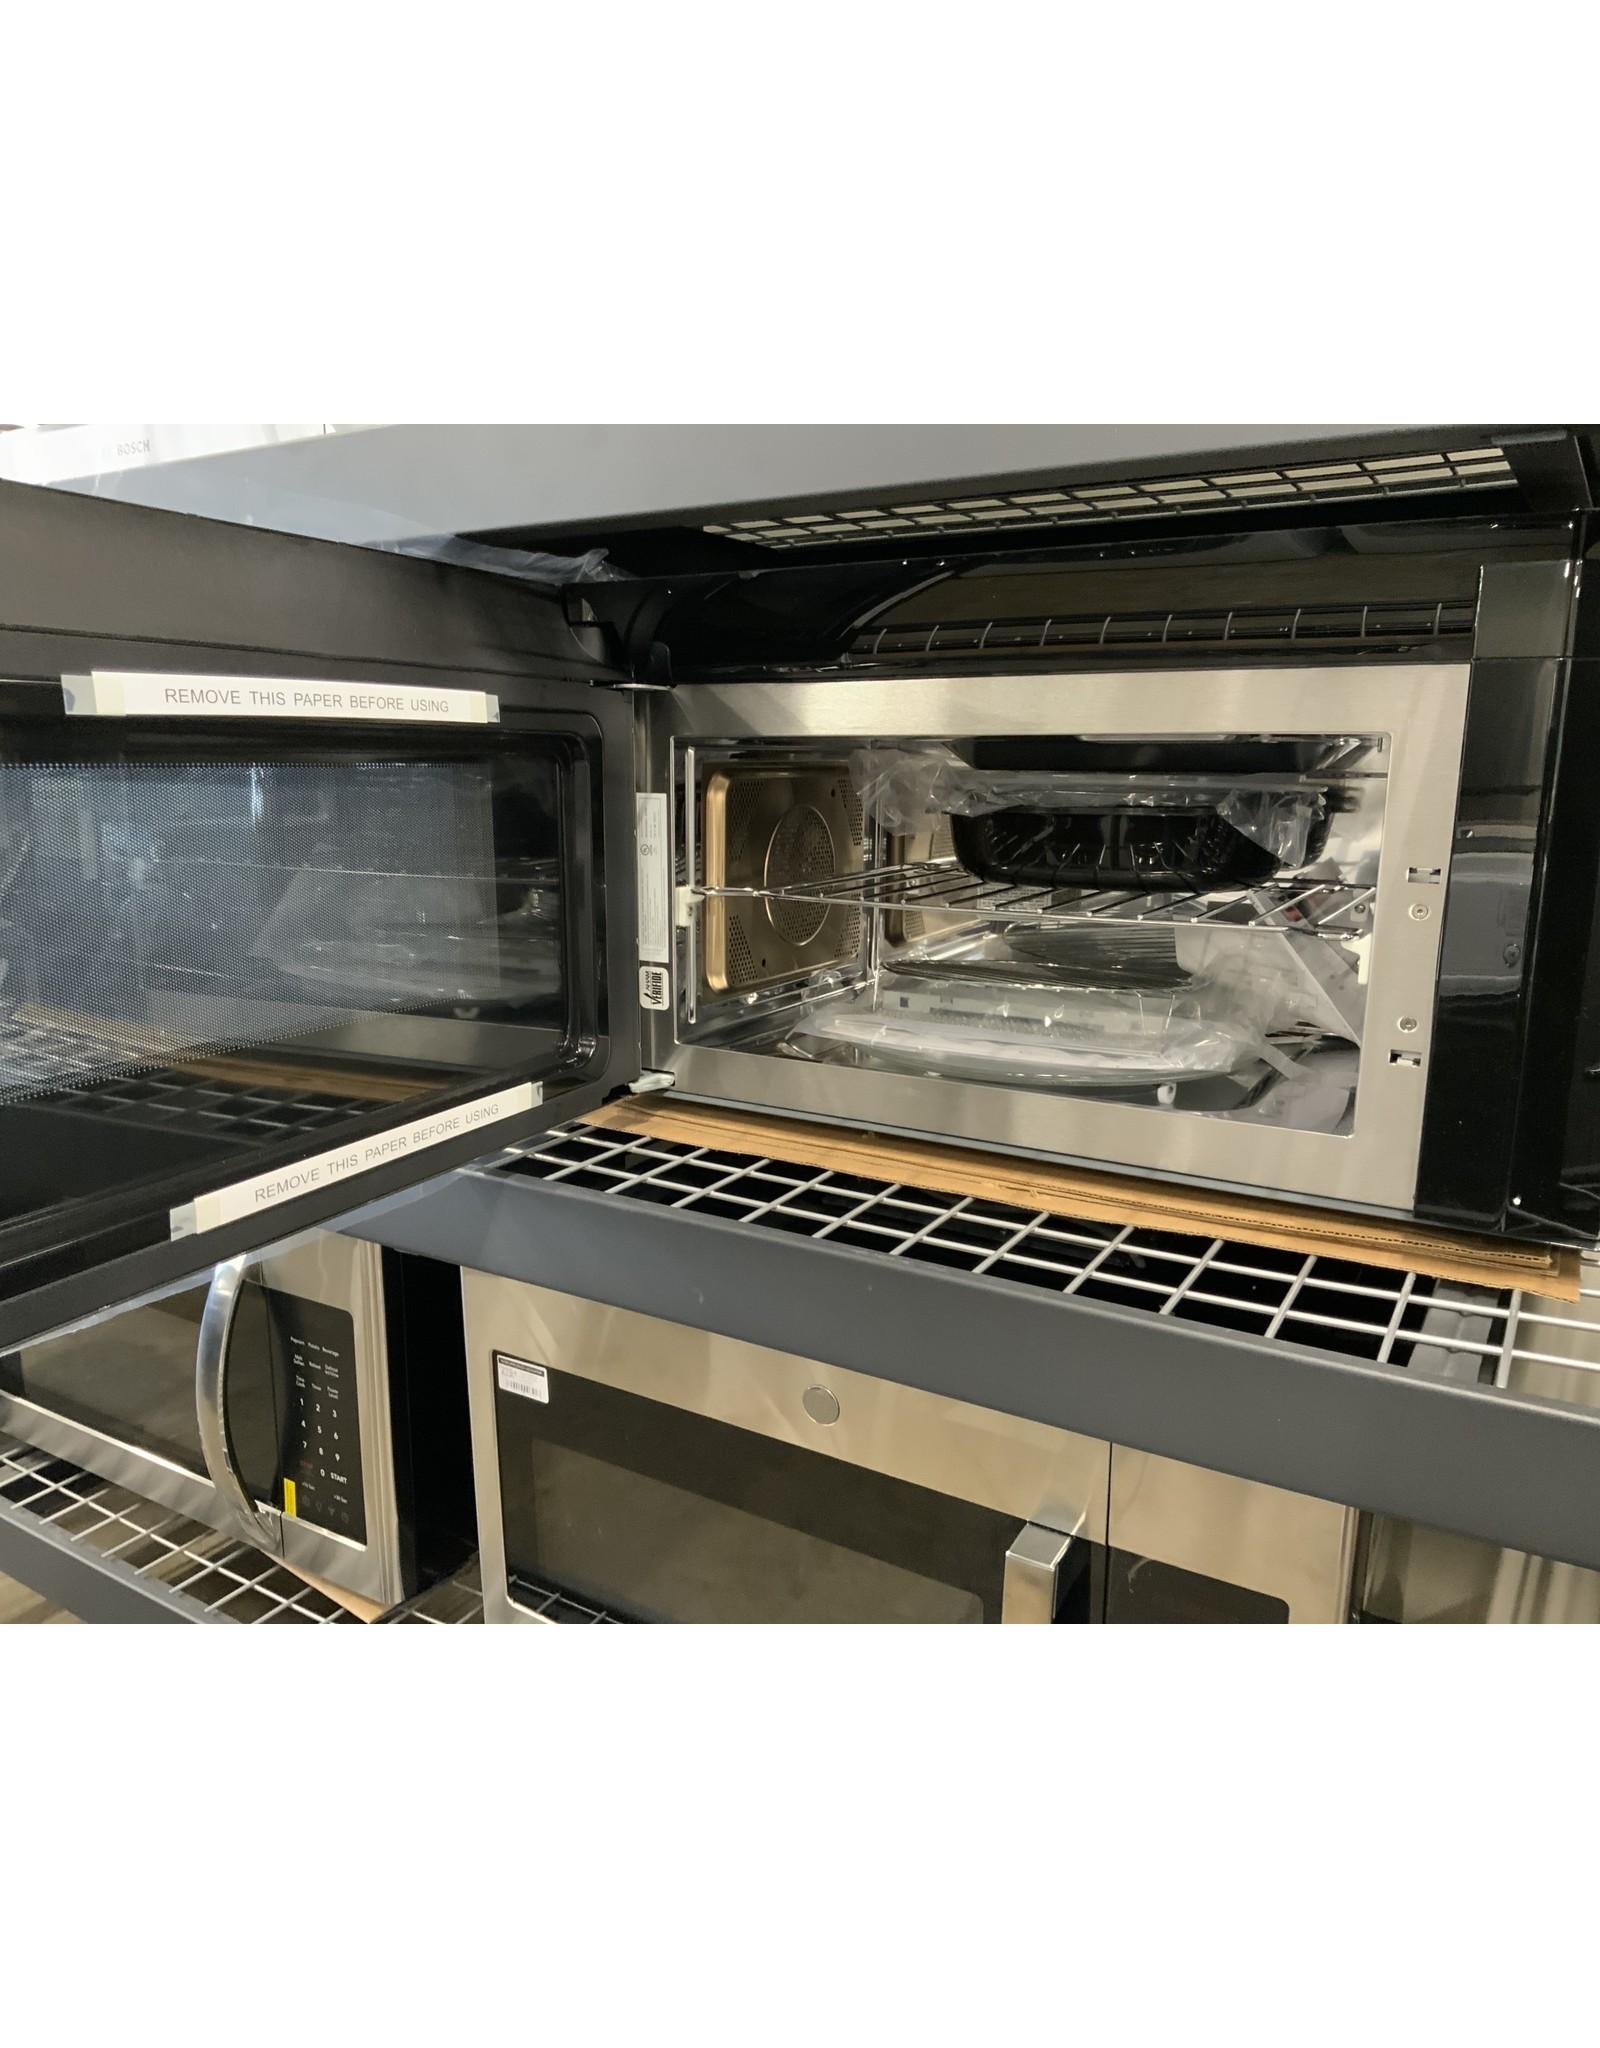 Kitchenaid KITCHEN AID KMHC319ESS Otr Convect Micro 1200w